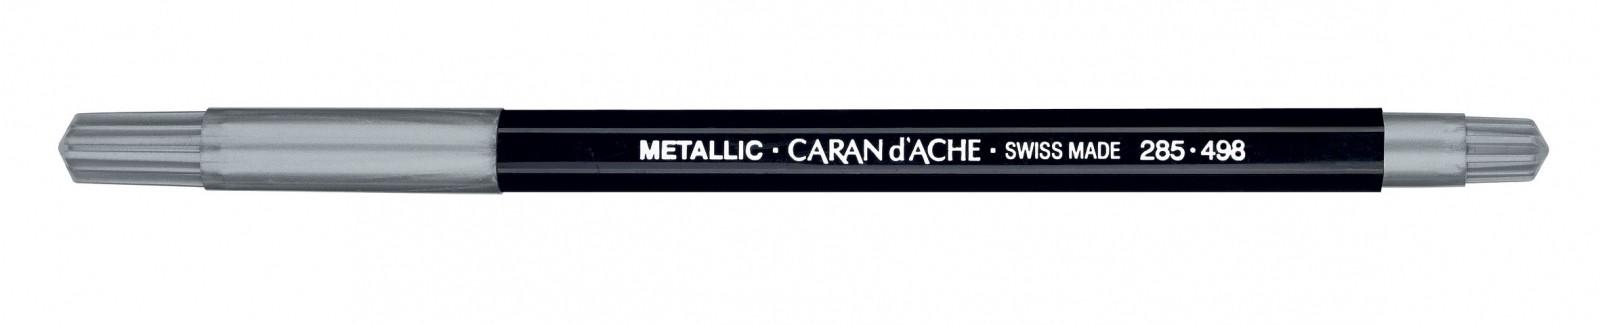 CANETA CARAN dACHE FANCOLOR METALICA PRATA